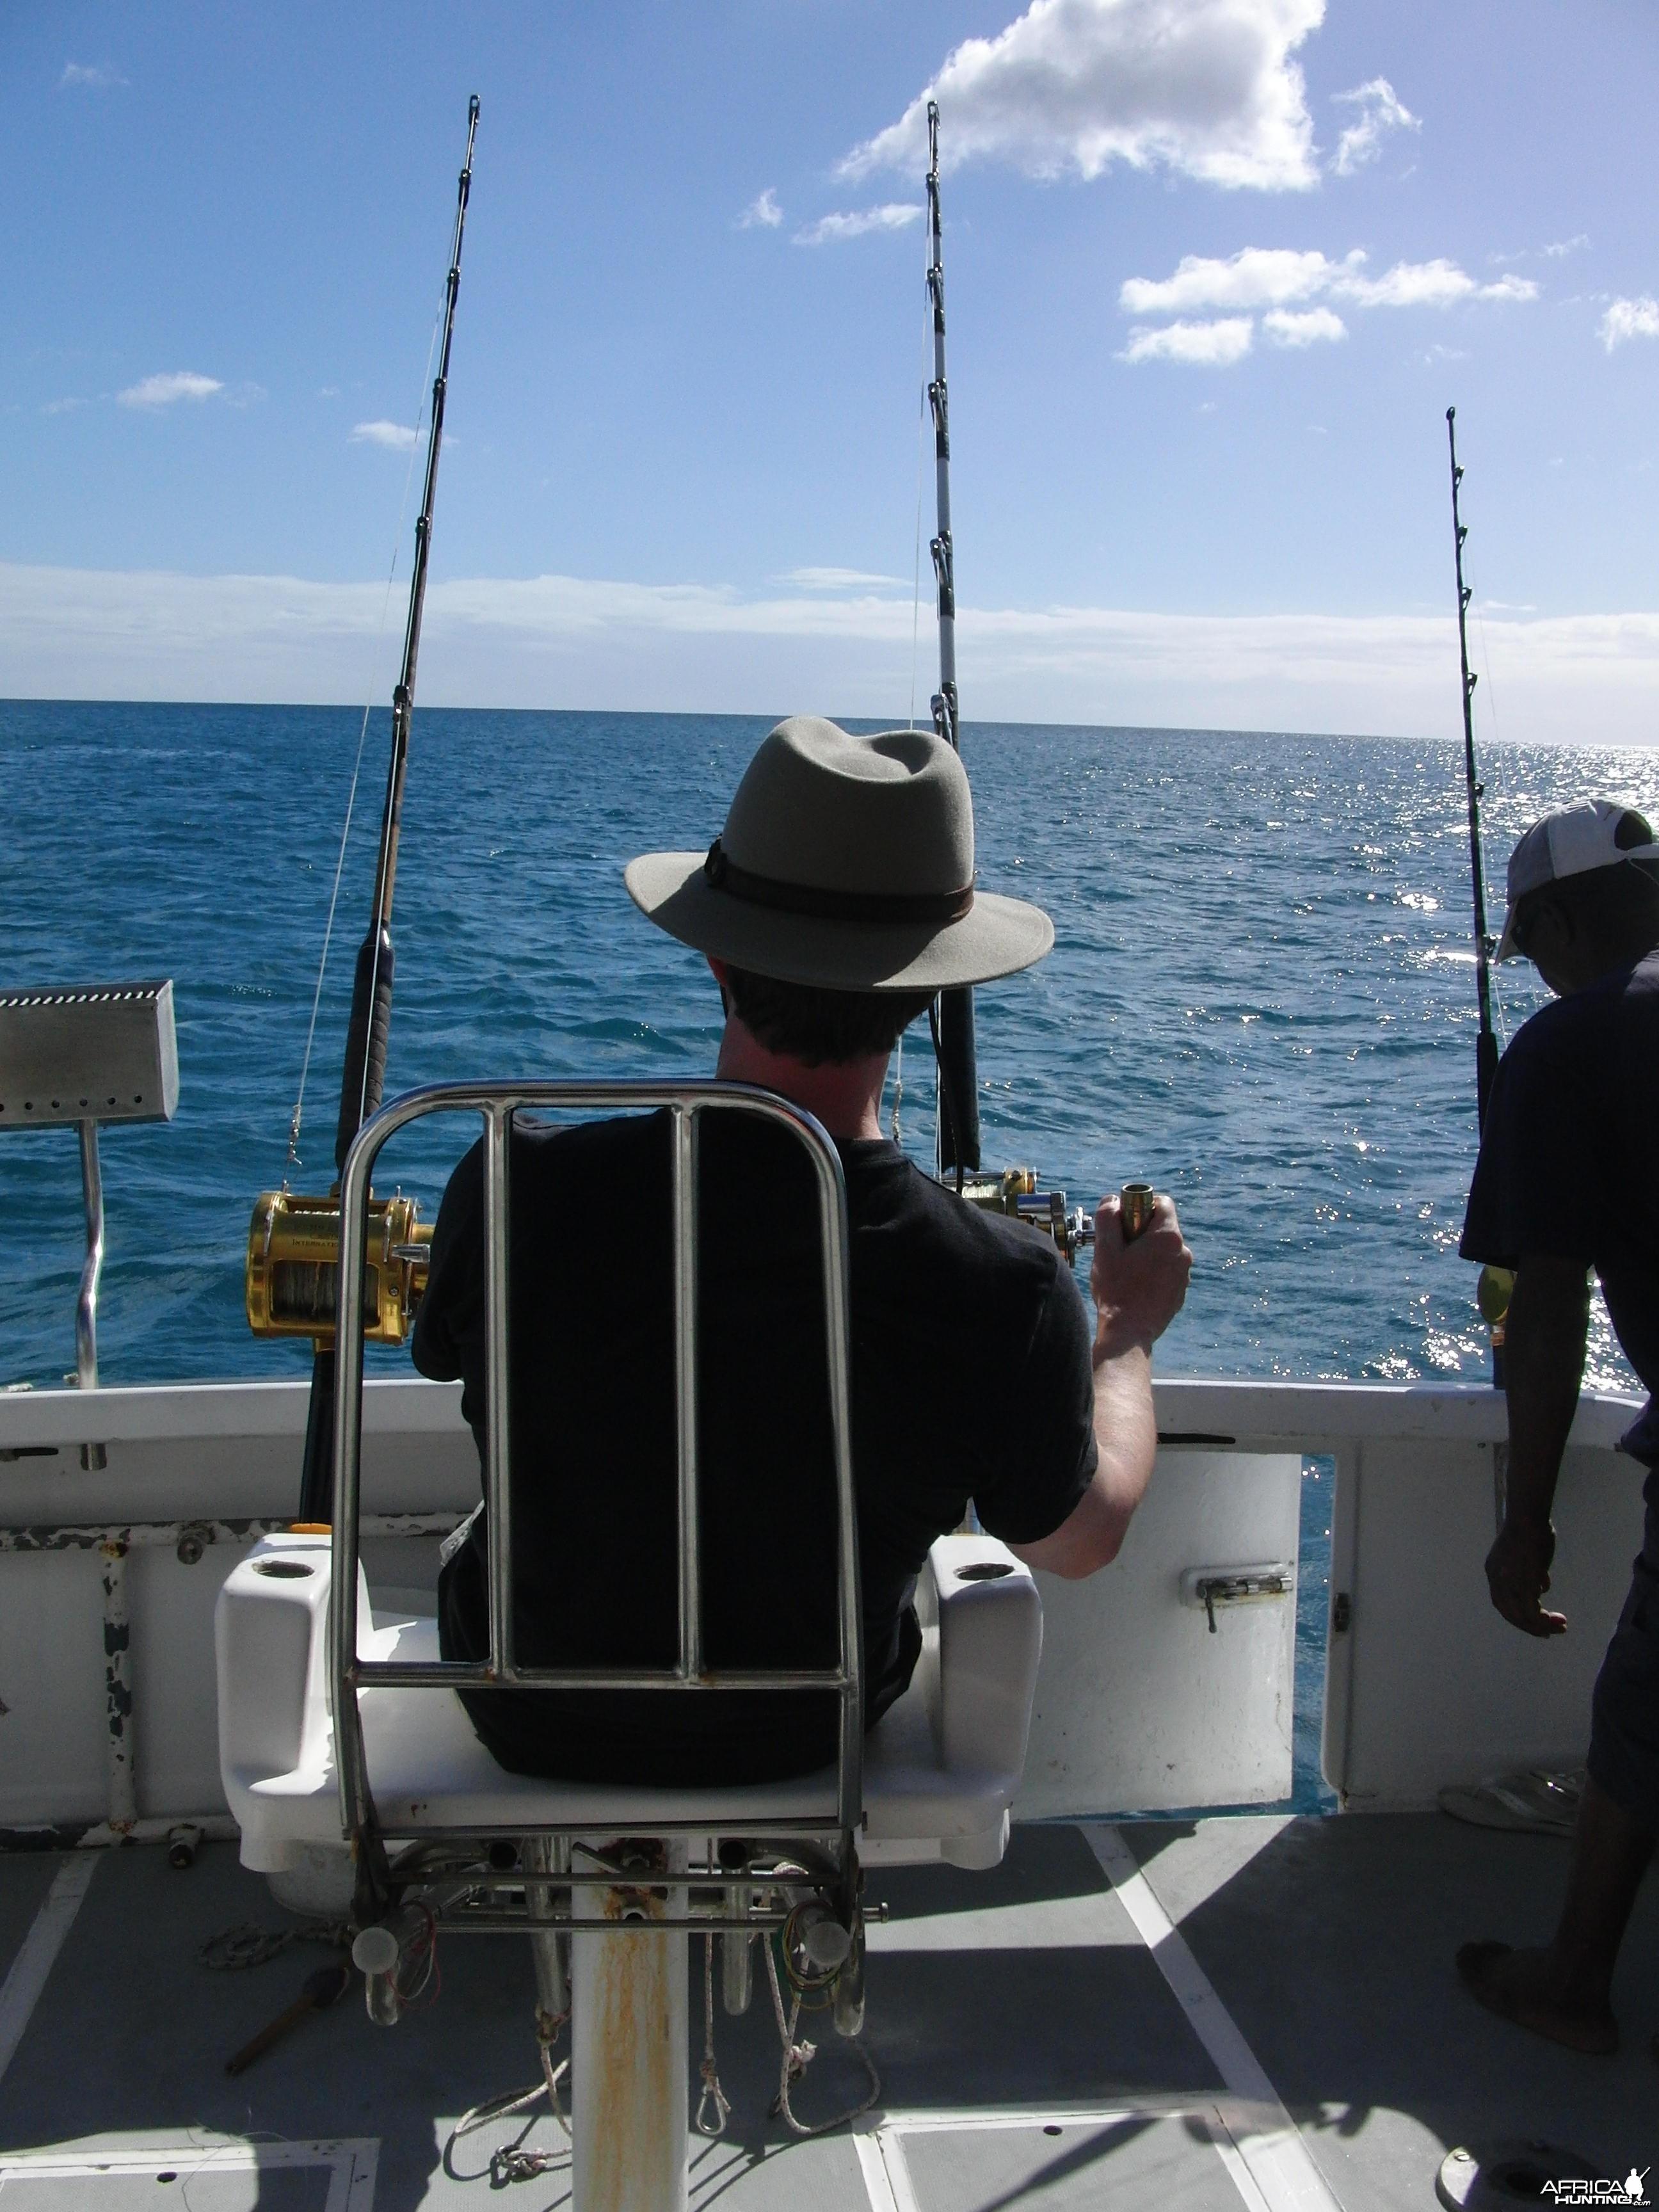 Boat trip in Mauritius